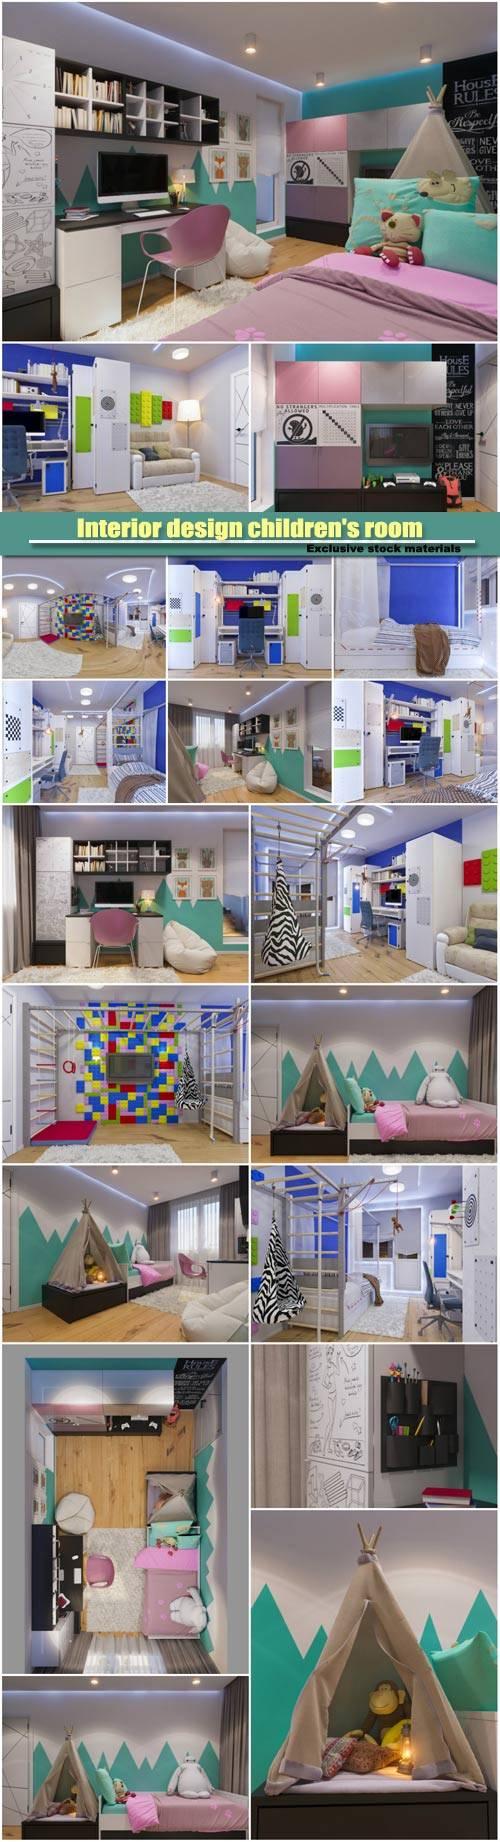 3d illustration of interior design children's room